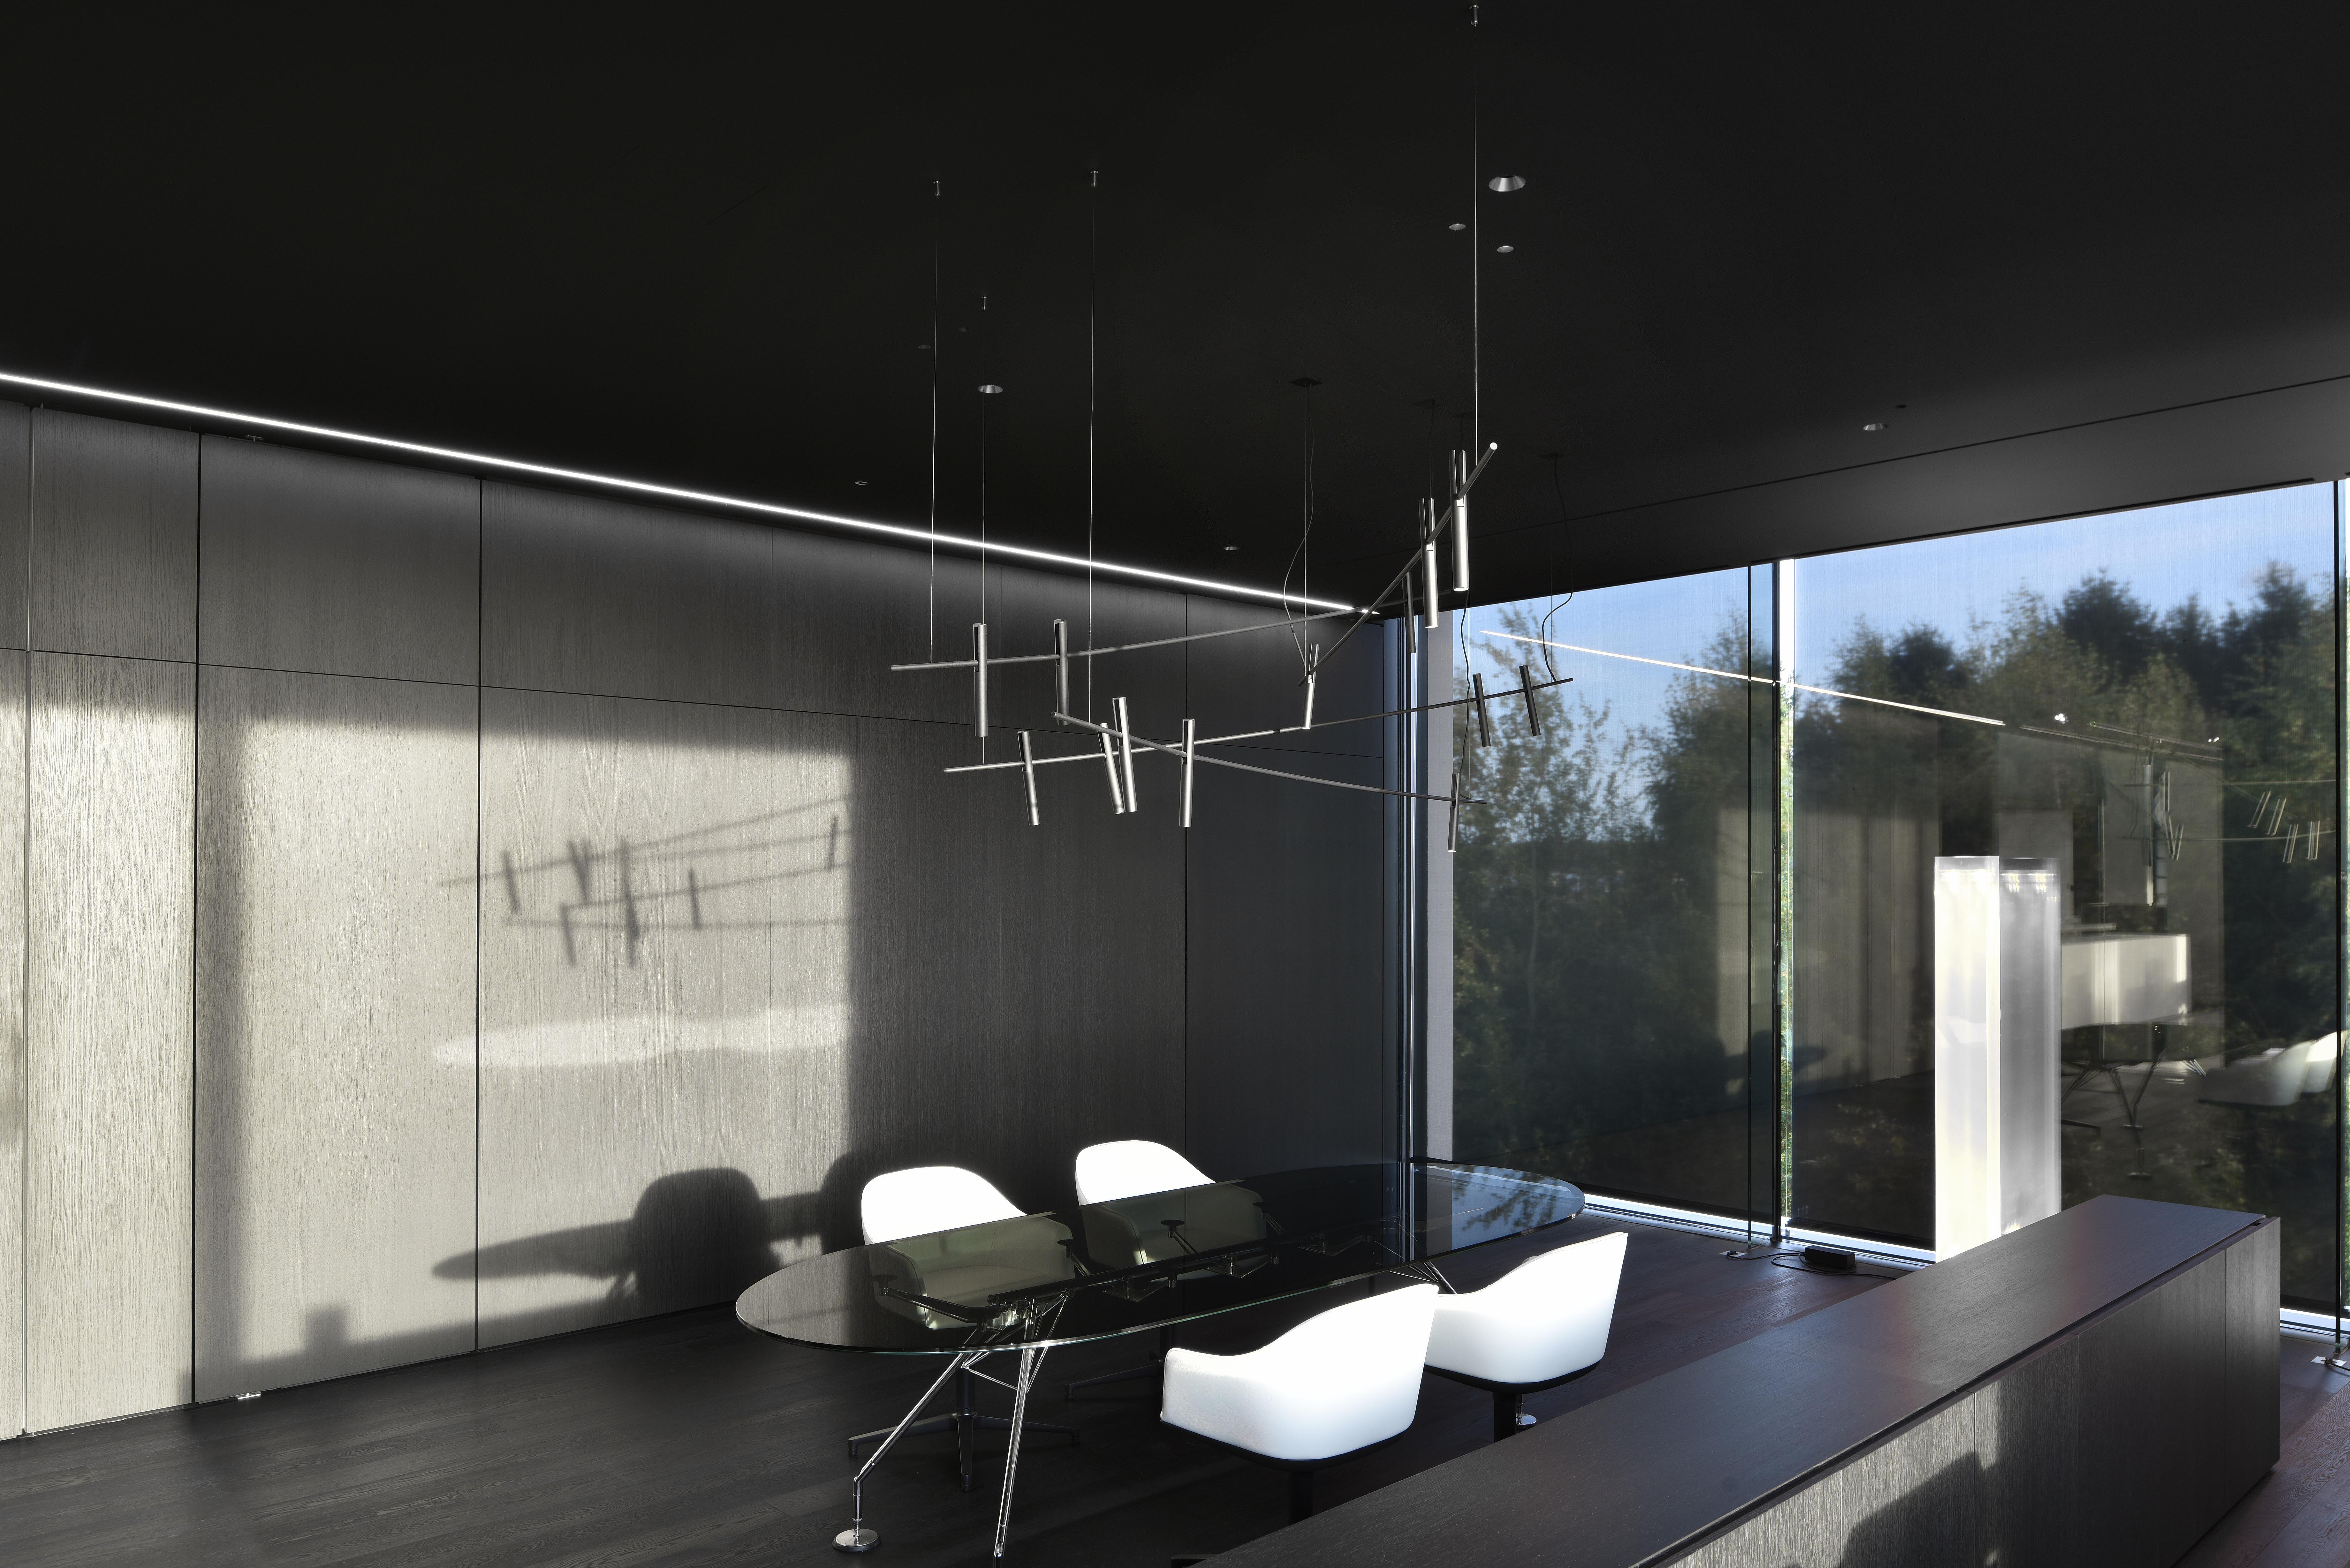 Merveilleux Office Pendant Light Big Window View Kreon Esprit LED Lighting Design